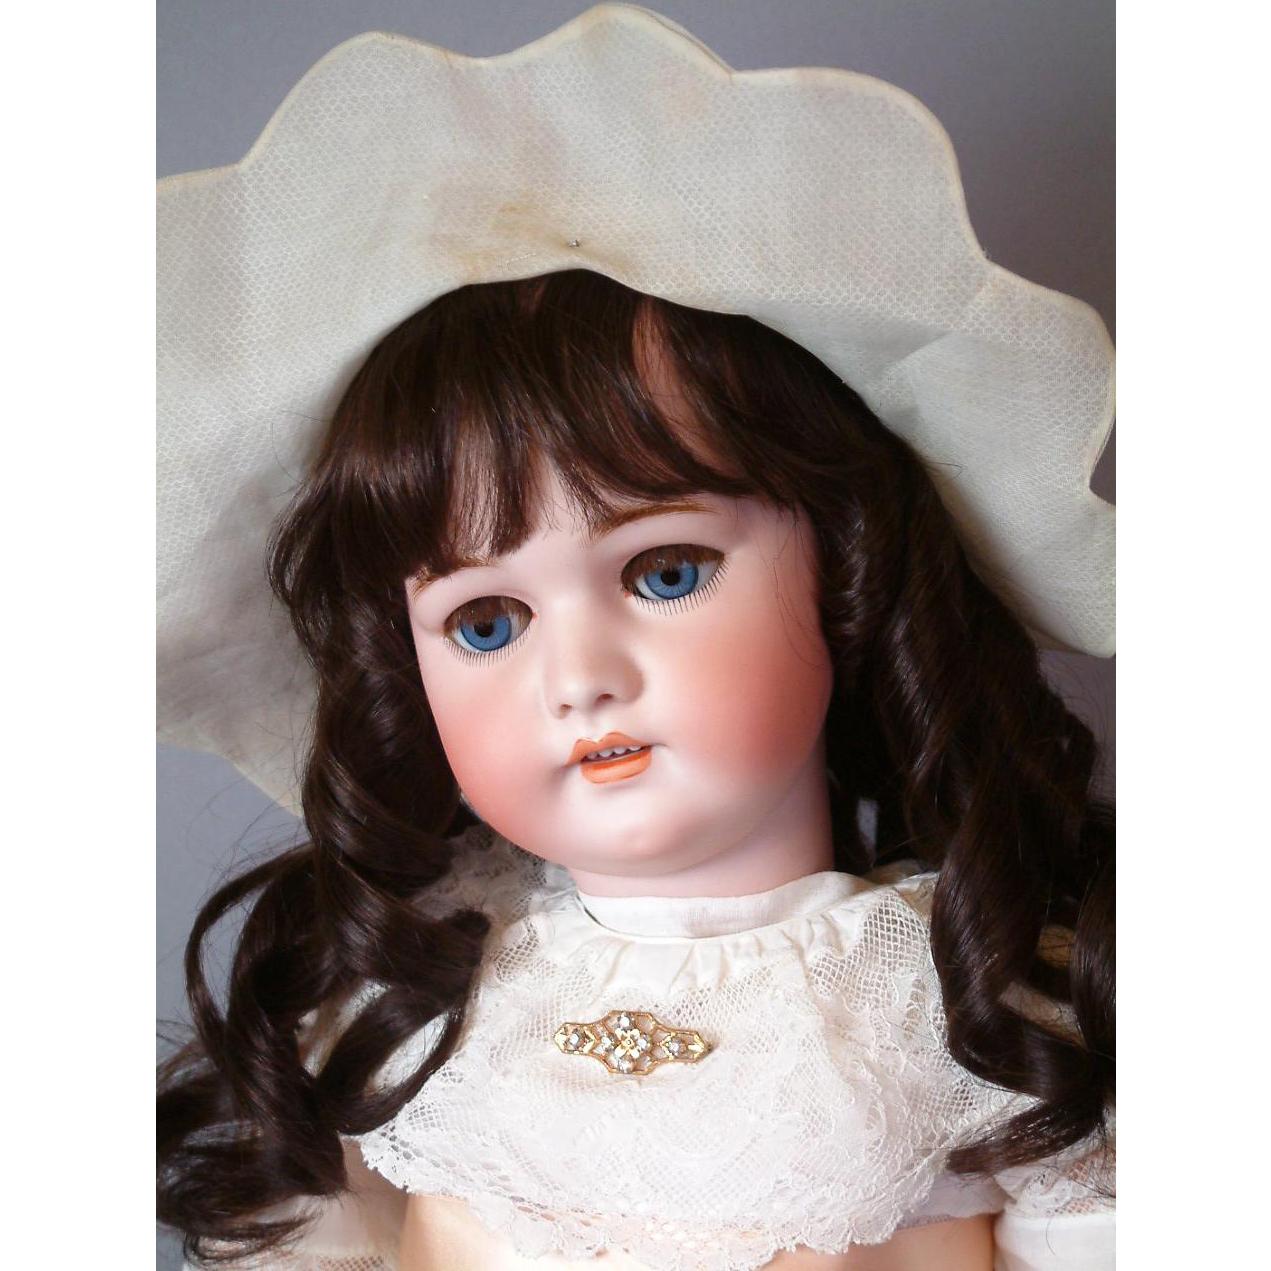 "*The Sweetest* 31"" Simon & Halbig 1079 DEP Antique Doll on Original Stamped Handwerck Body"